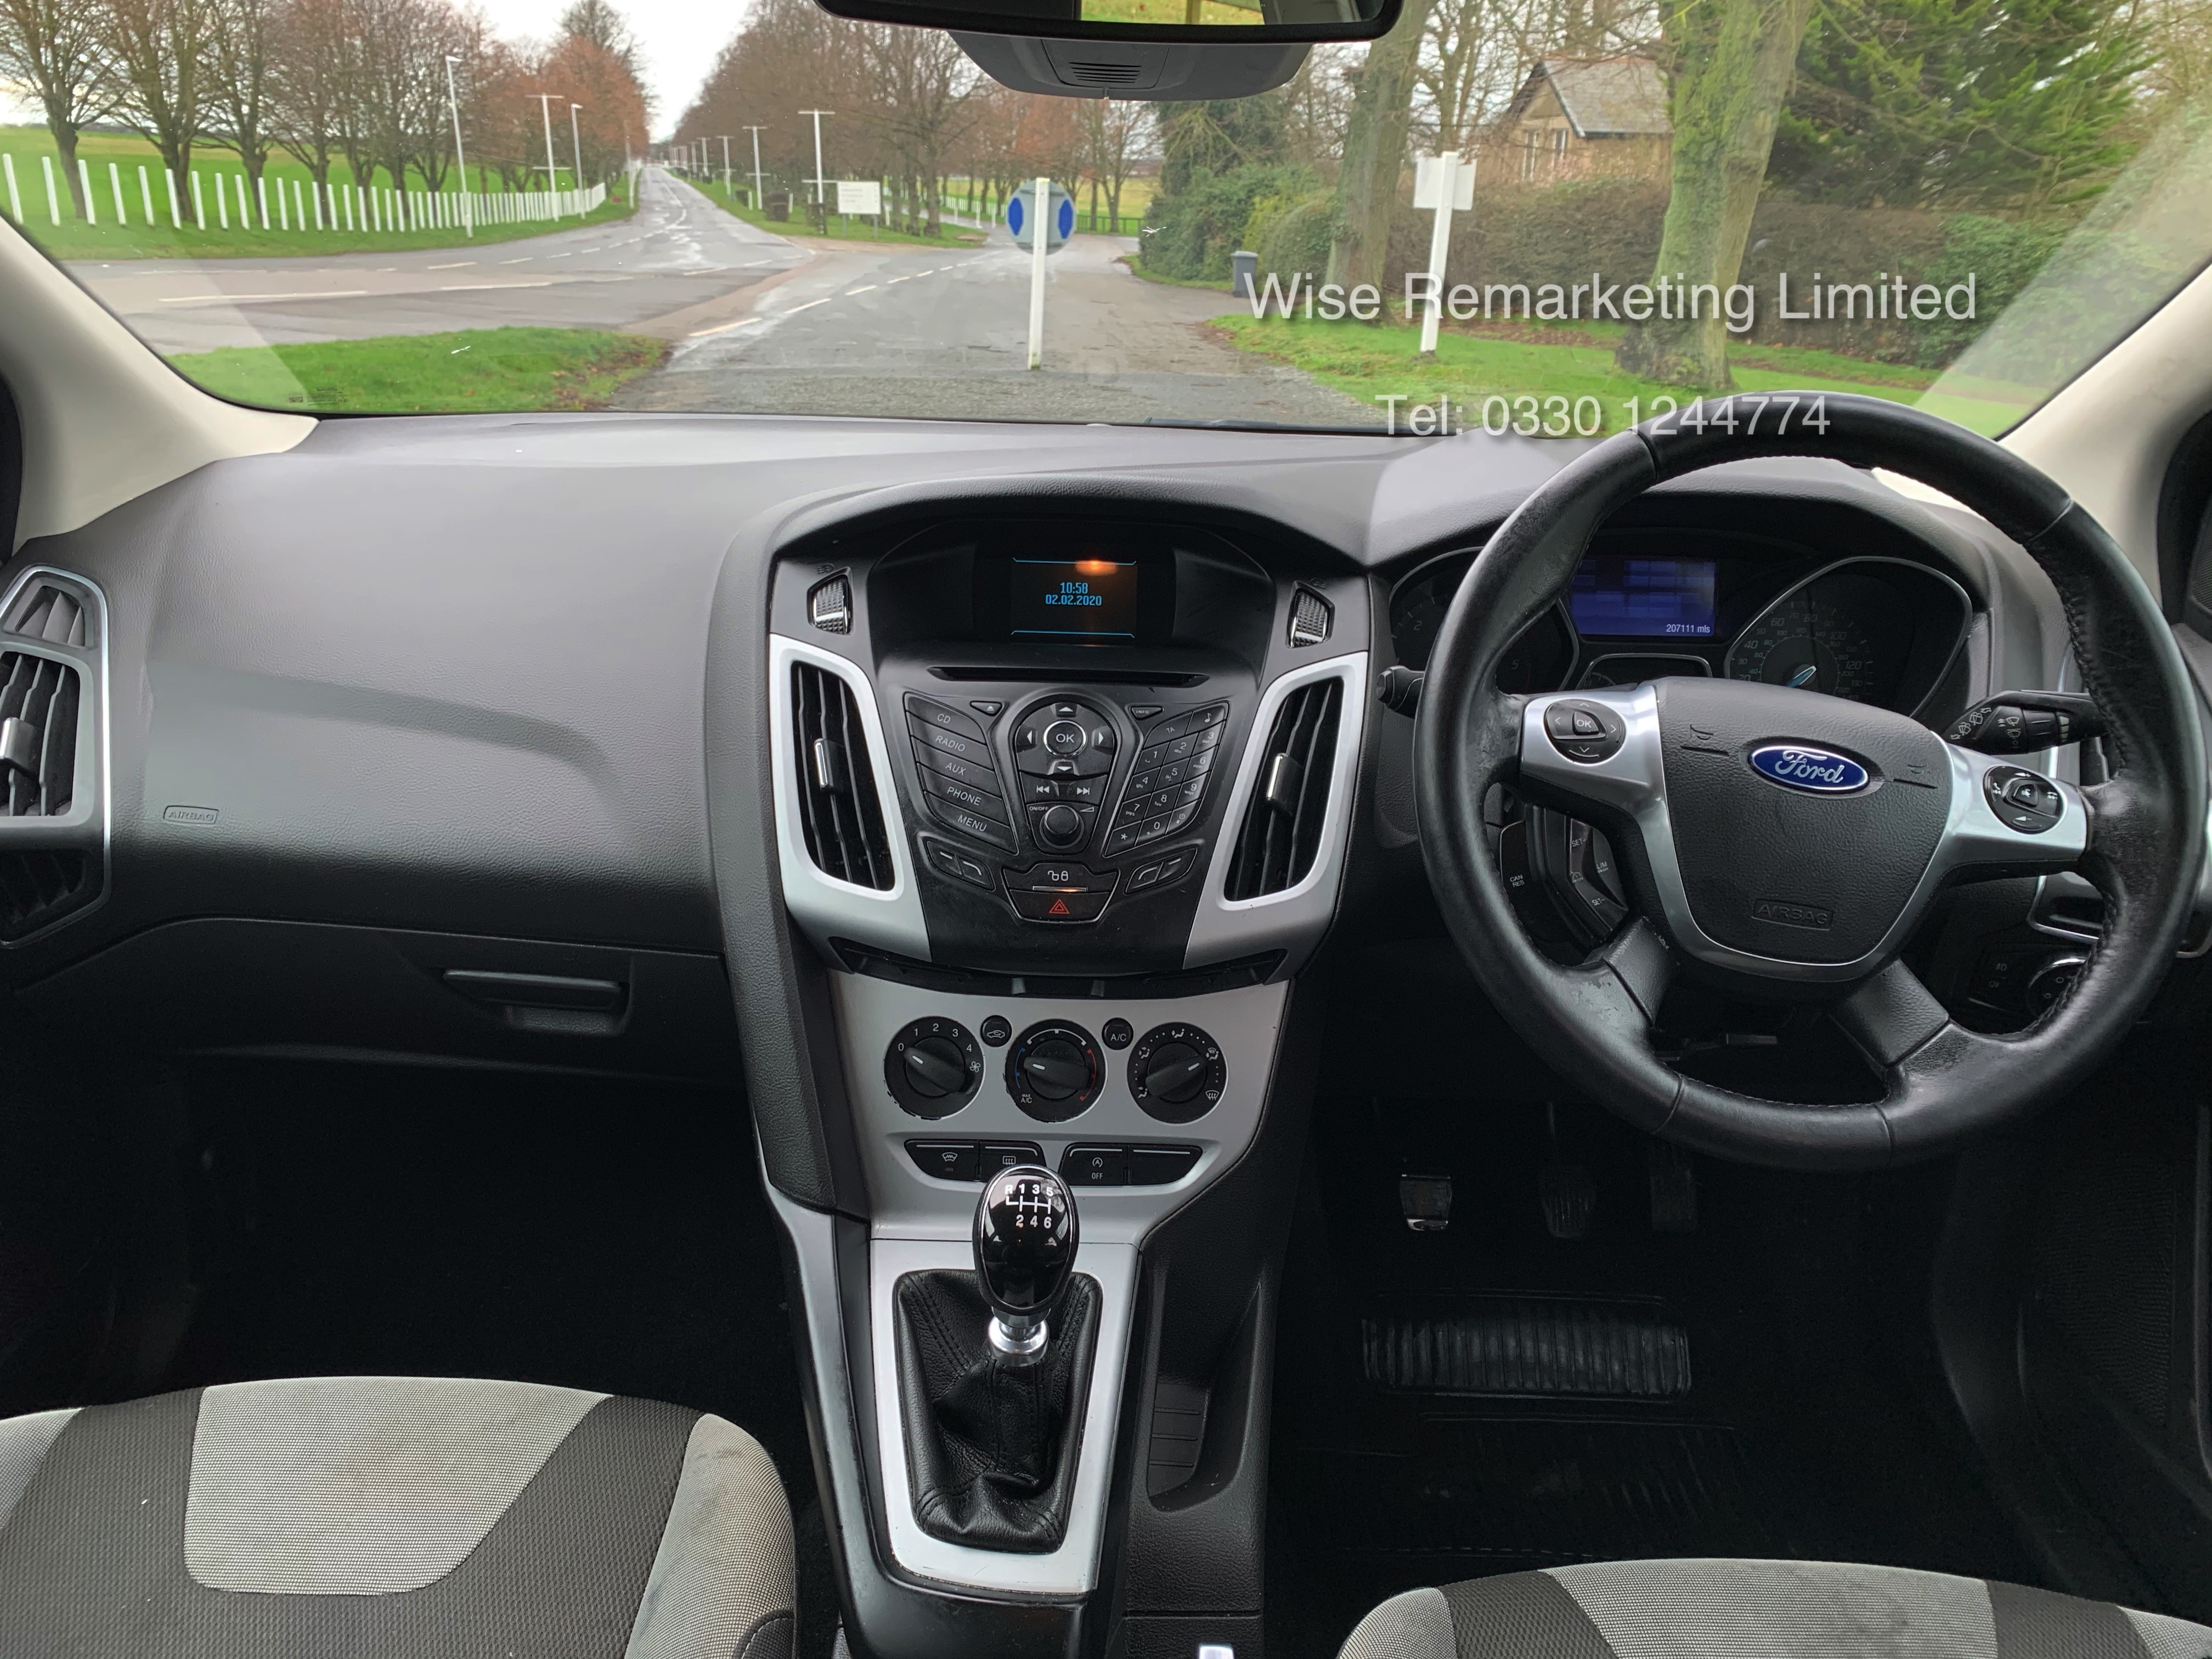 Ford Focus Zetec 1.6 TDCI Econetic - 2015 Model - 6 Speed - - Image 15 of 20